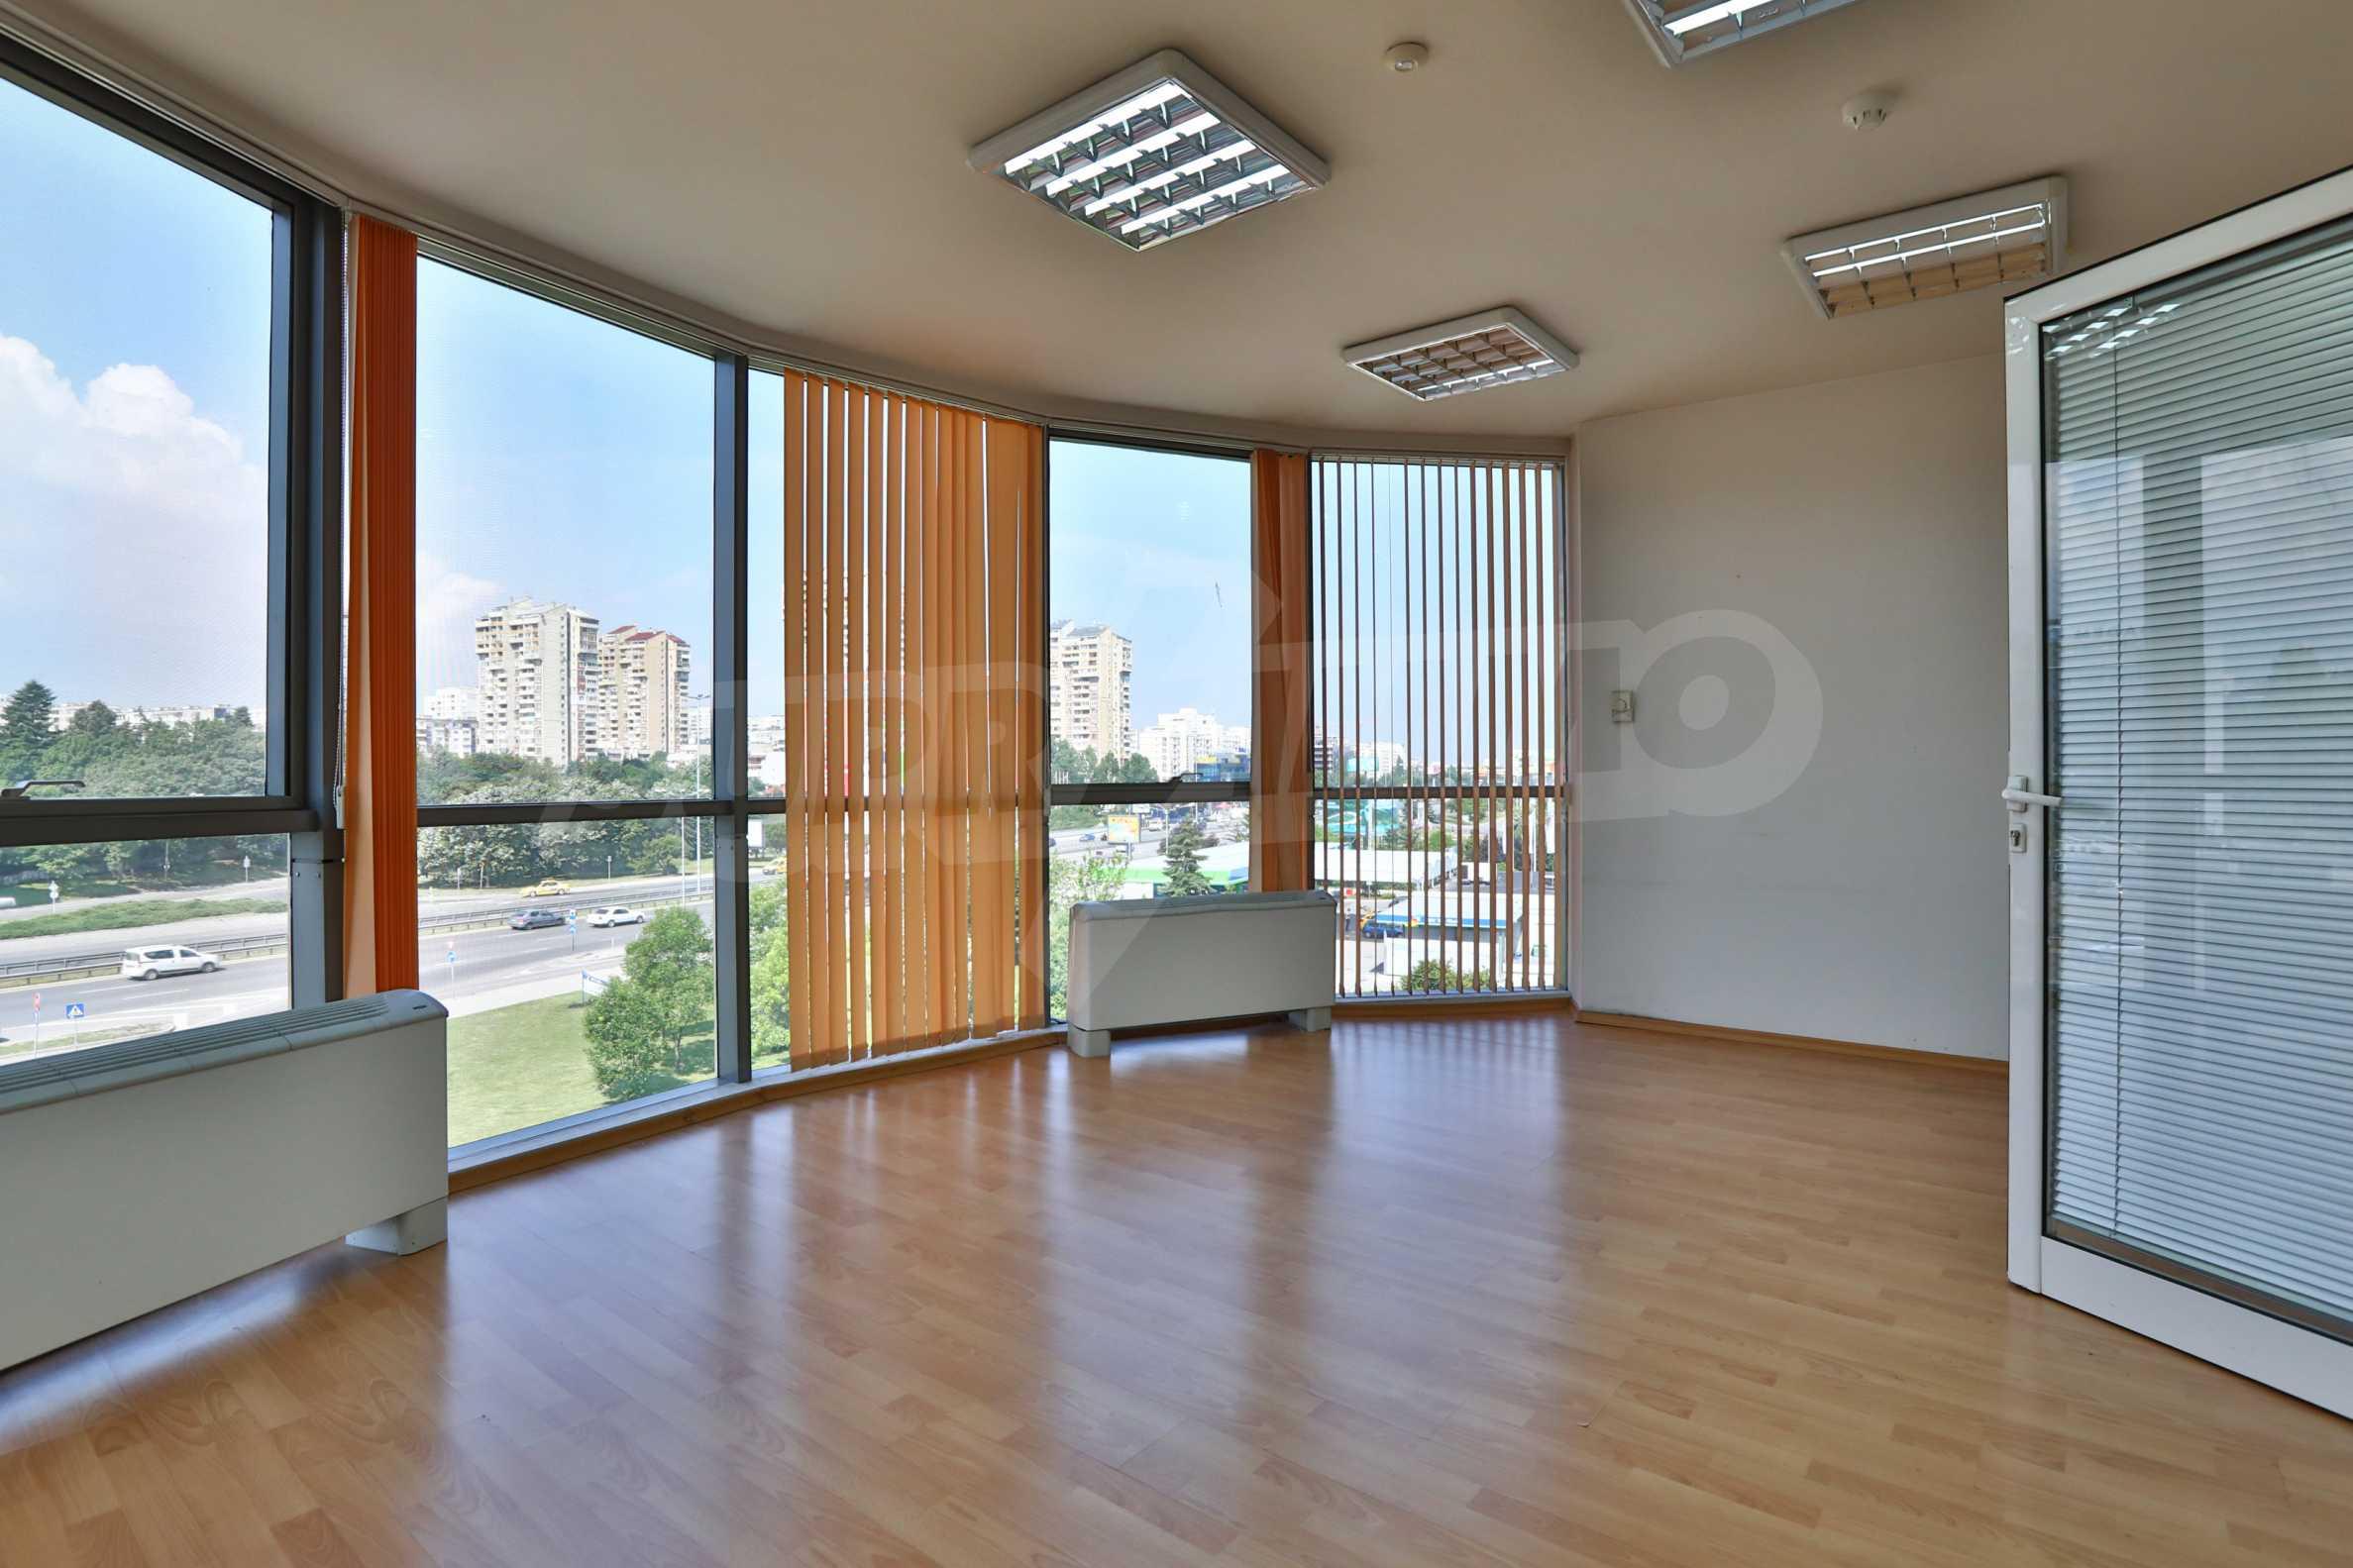 Офис в бизнес сграда висок клас на бул. Цариградско шосе 26